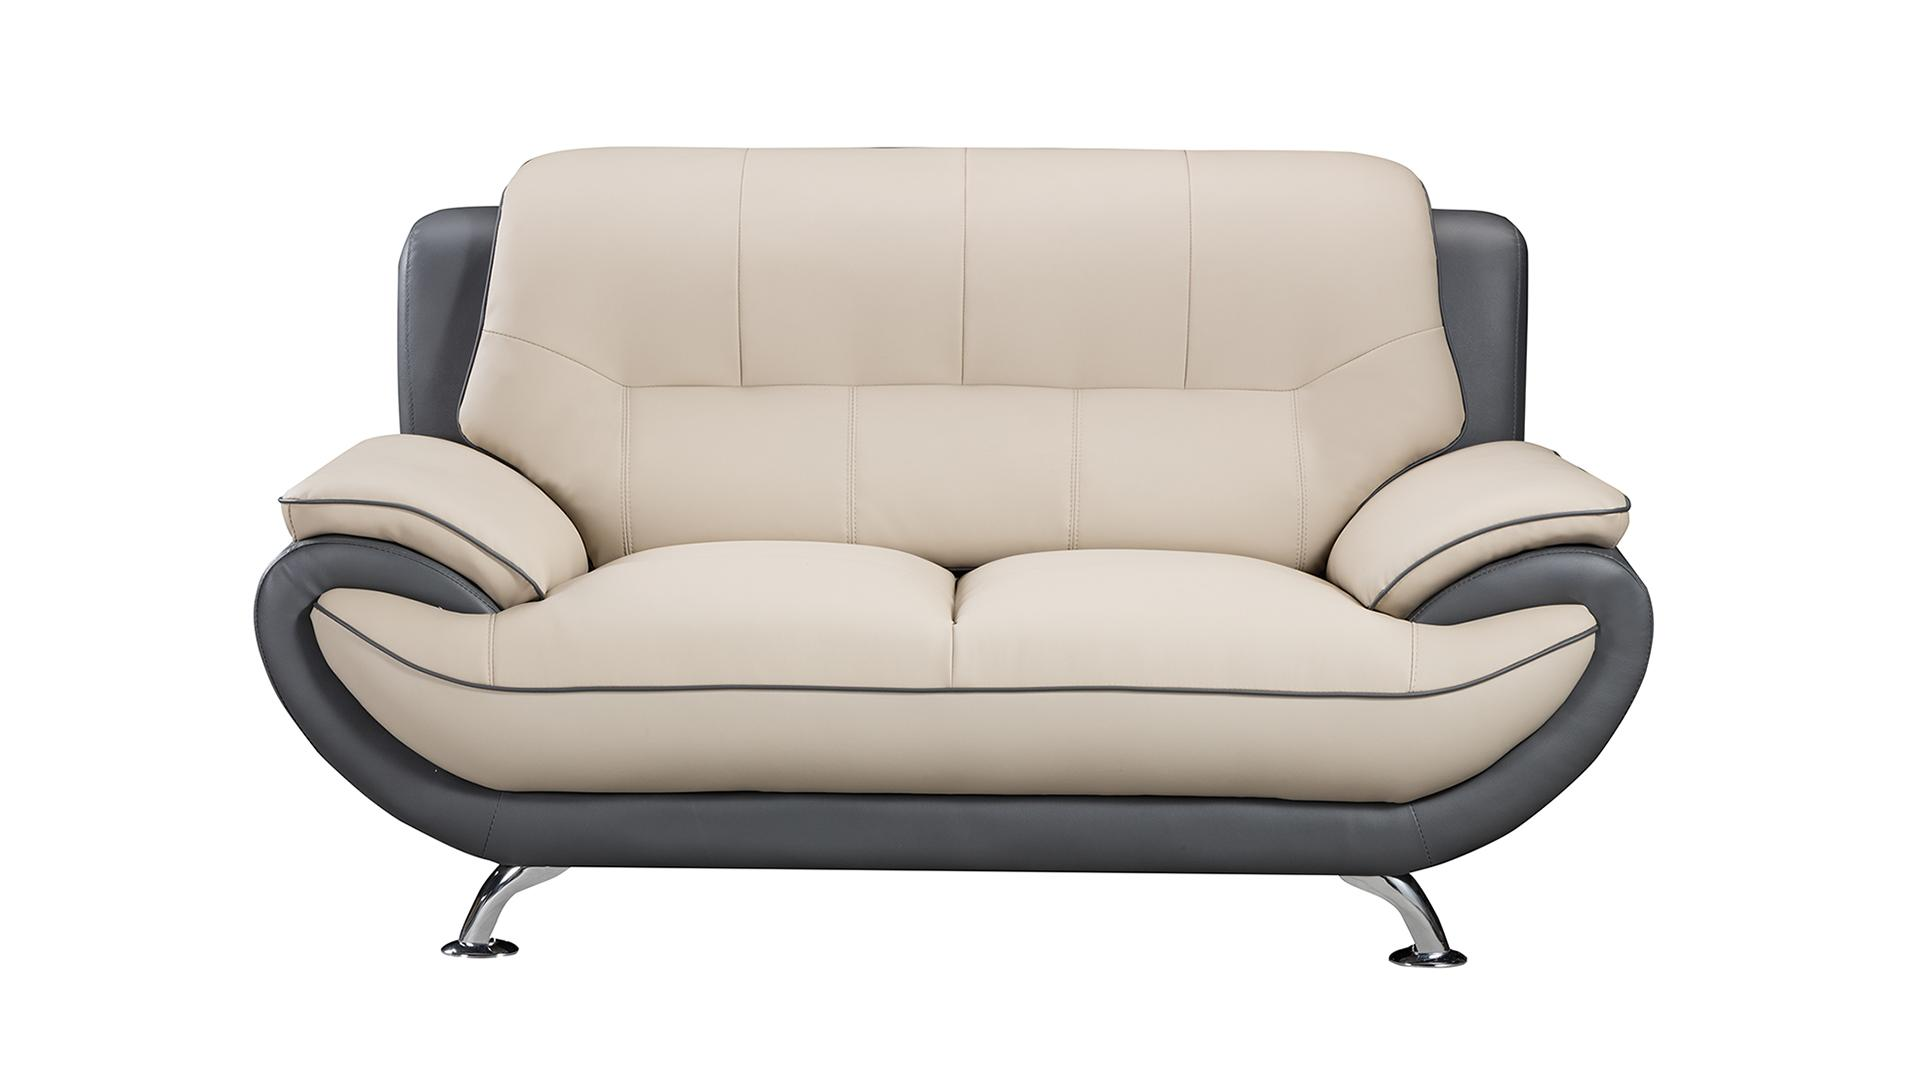 Amazon.com: American Eagle Furniture Bonded Leather Living Room Sofa ...